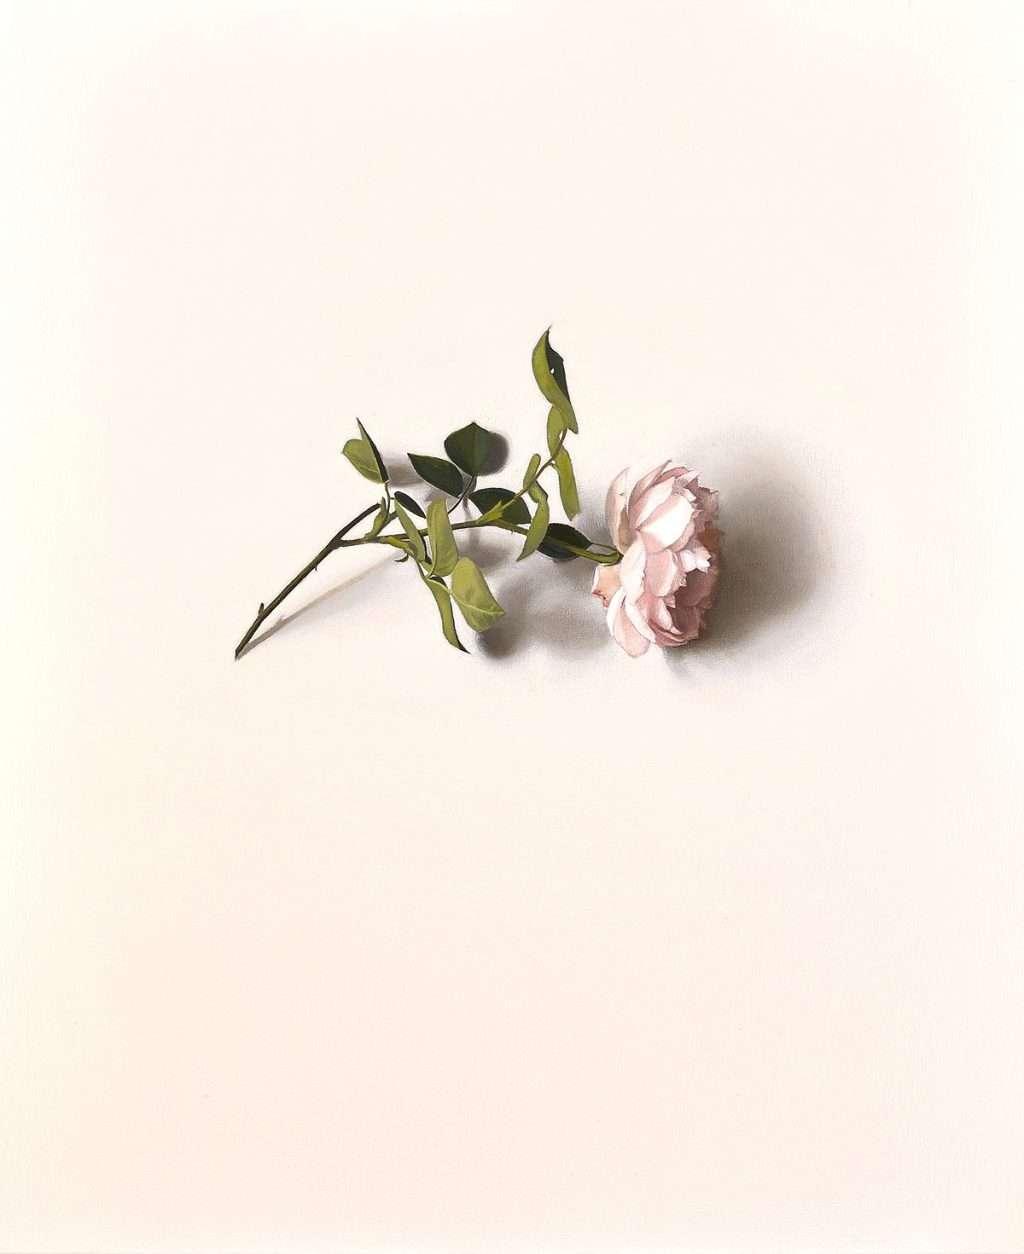 Alison Watt, 'Centifolia', oil on canvas